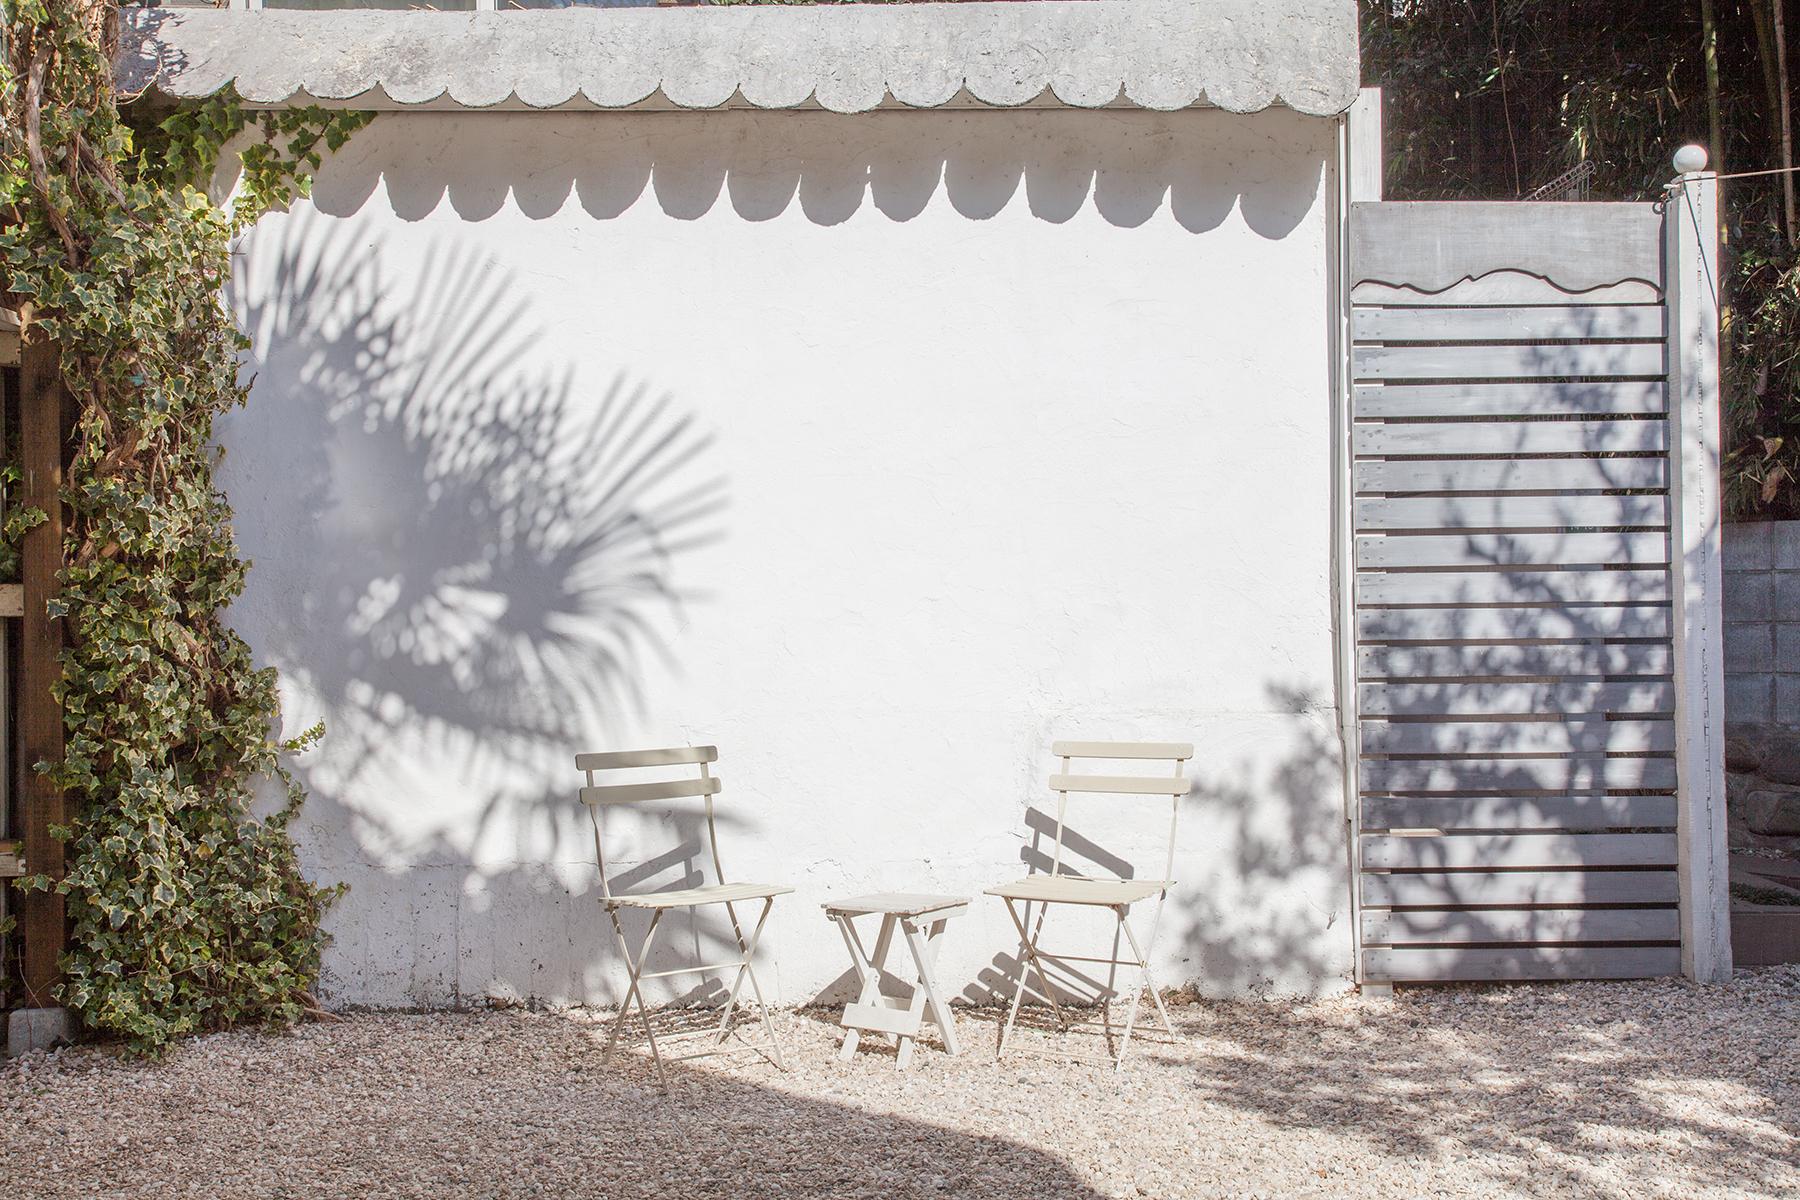 Rapture Studio (ラプチャースタジオ)玄関と倉庫小屋